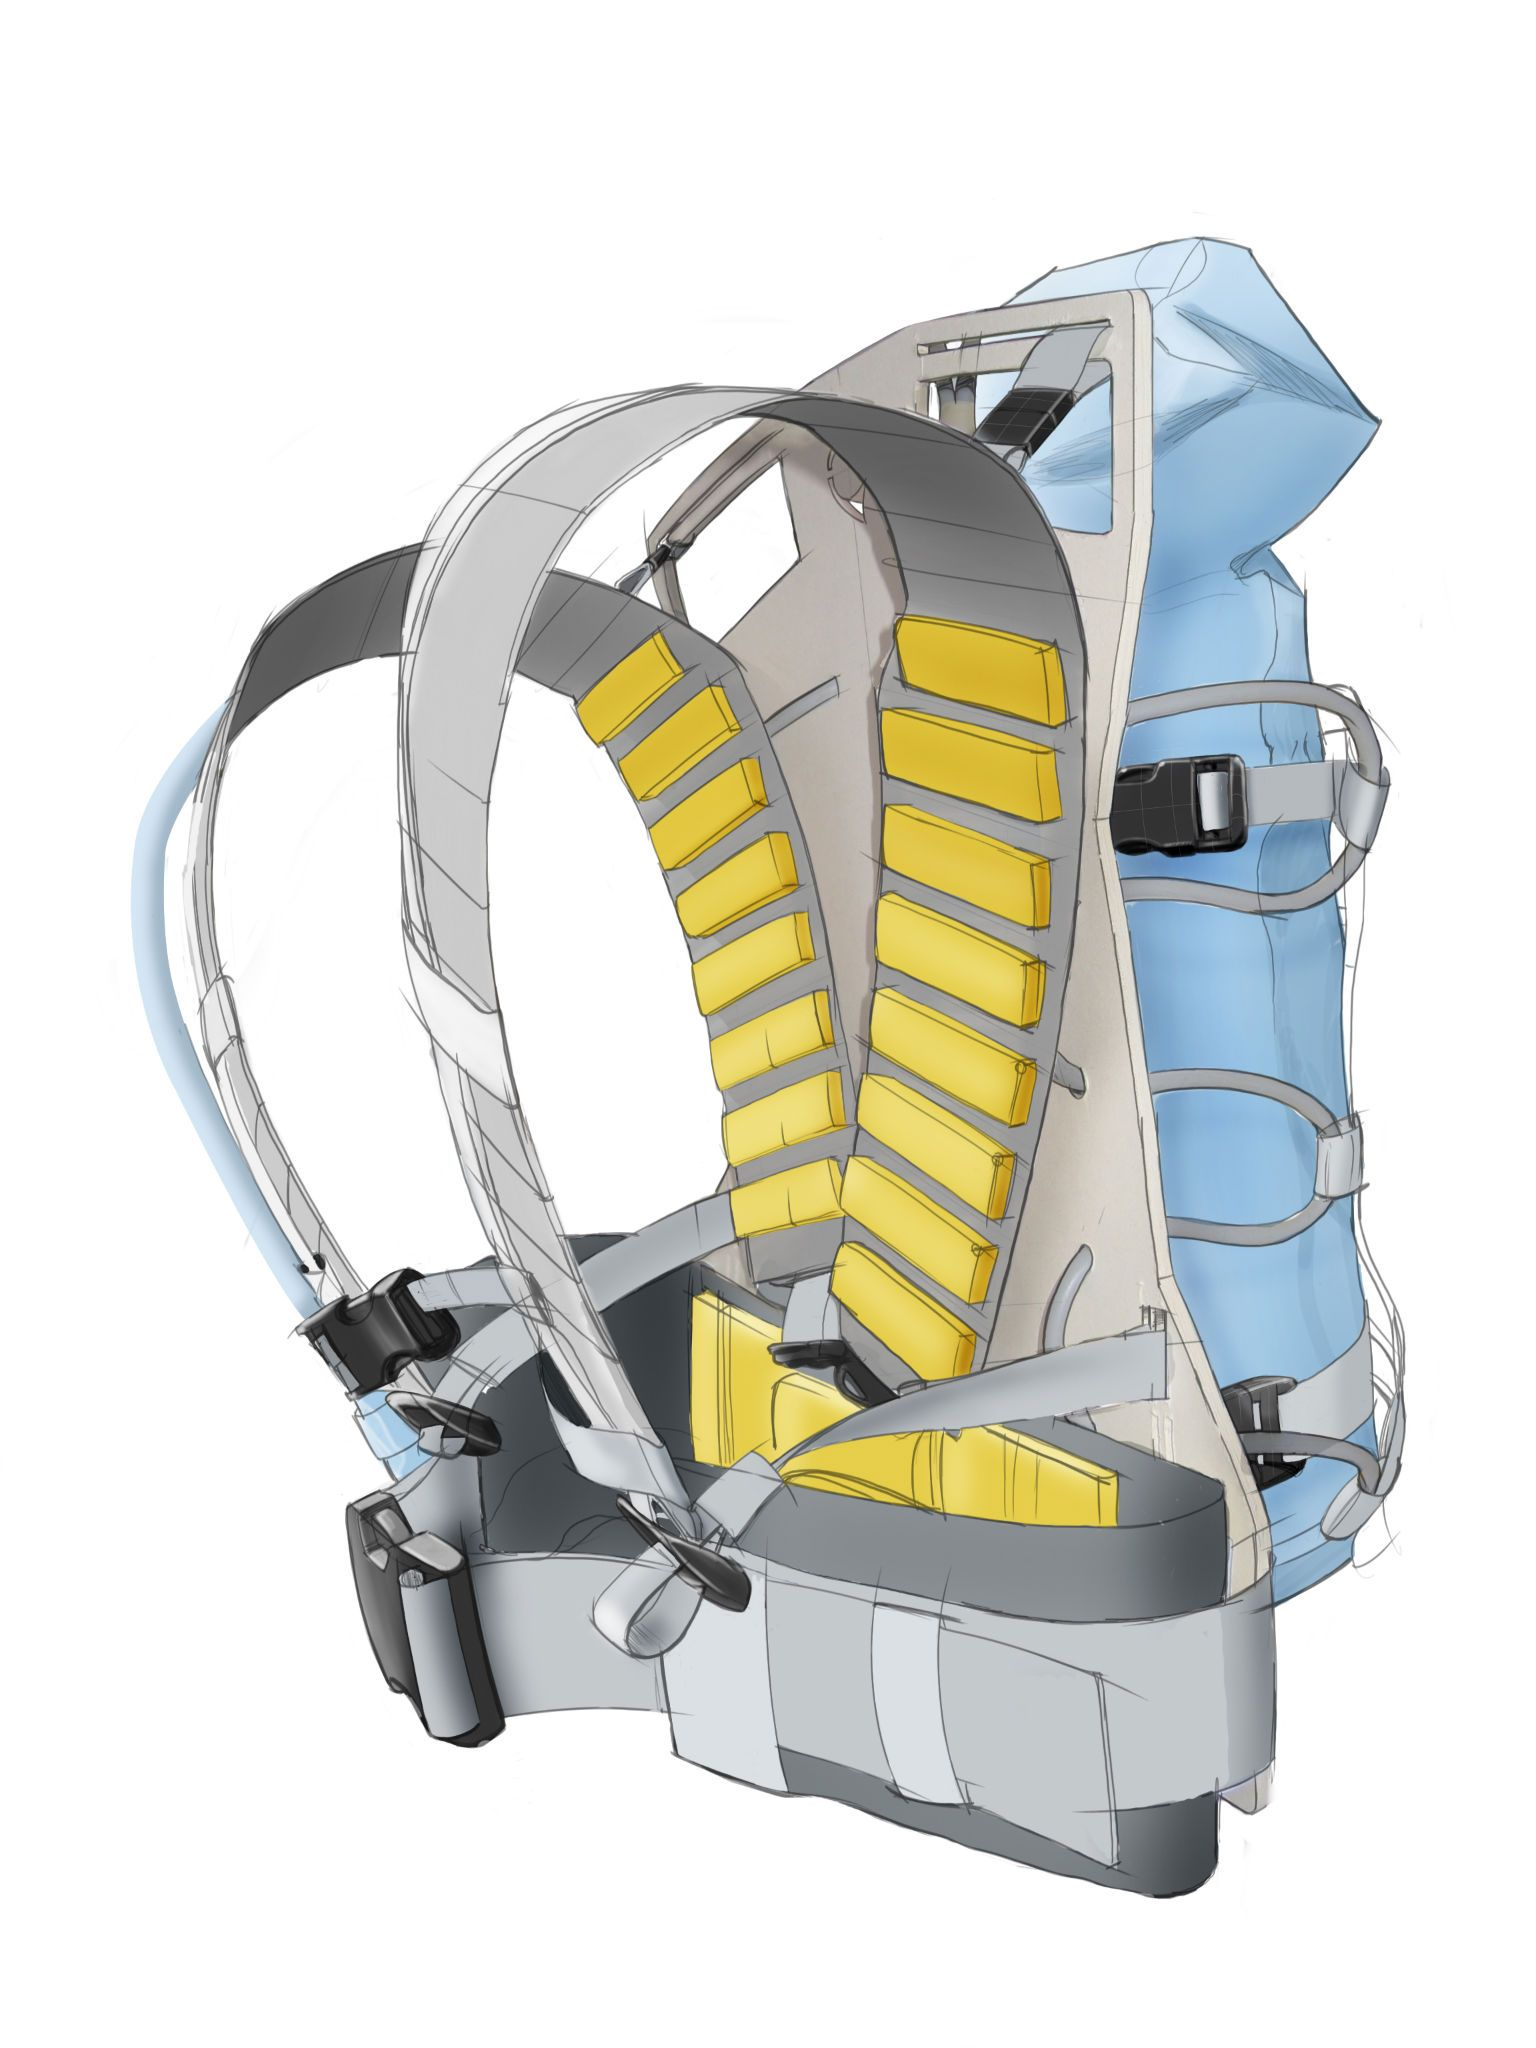 Zonda Emergency hidration backpack